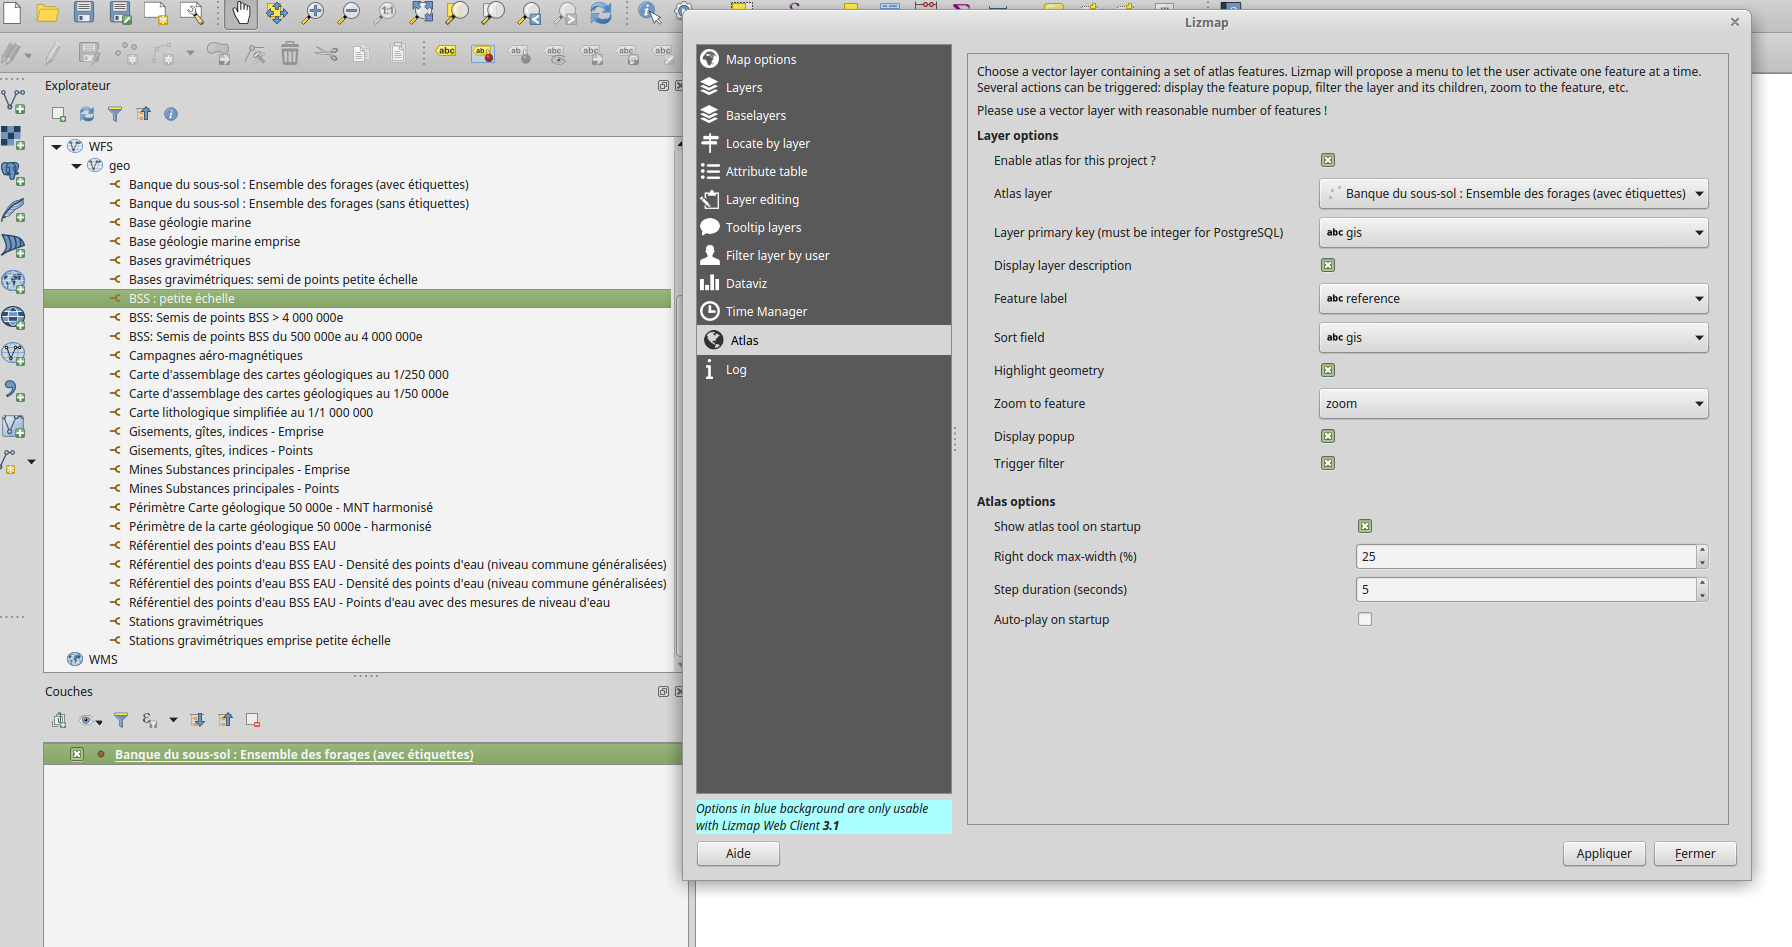 Atlas menu is not opening · Issue #737 · 3liz/lizmap-web